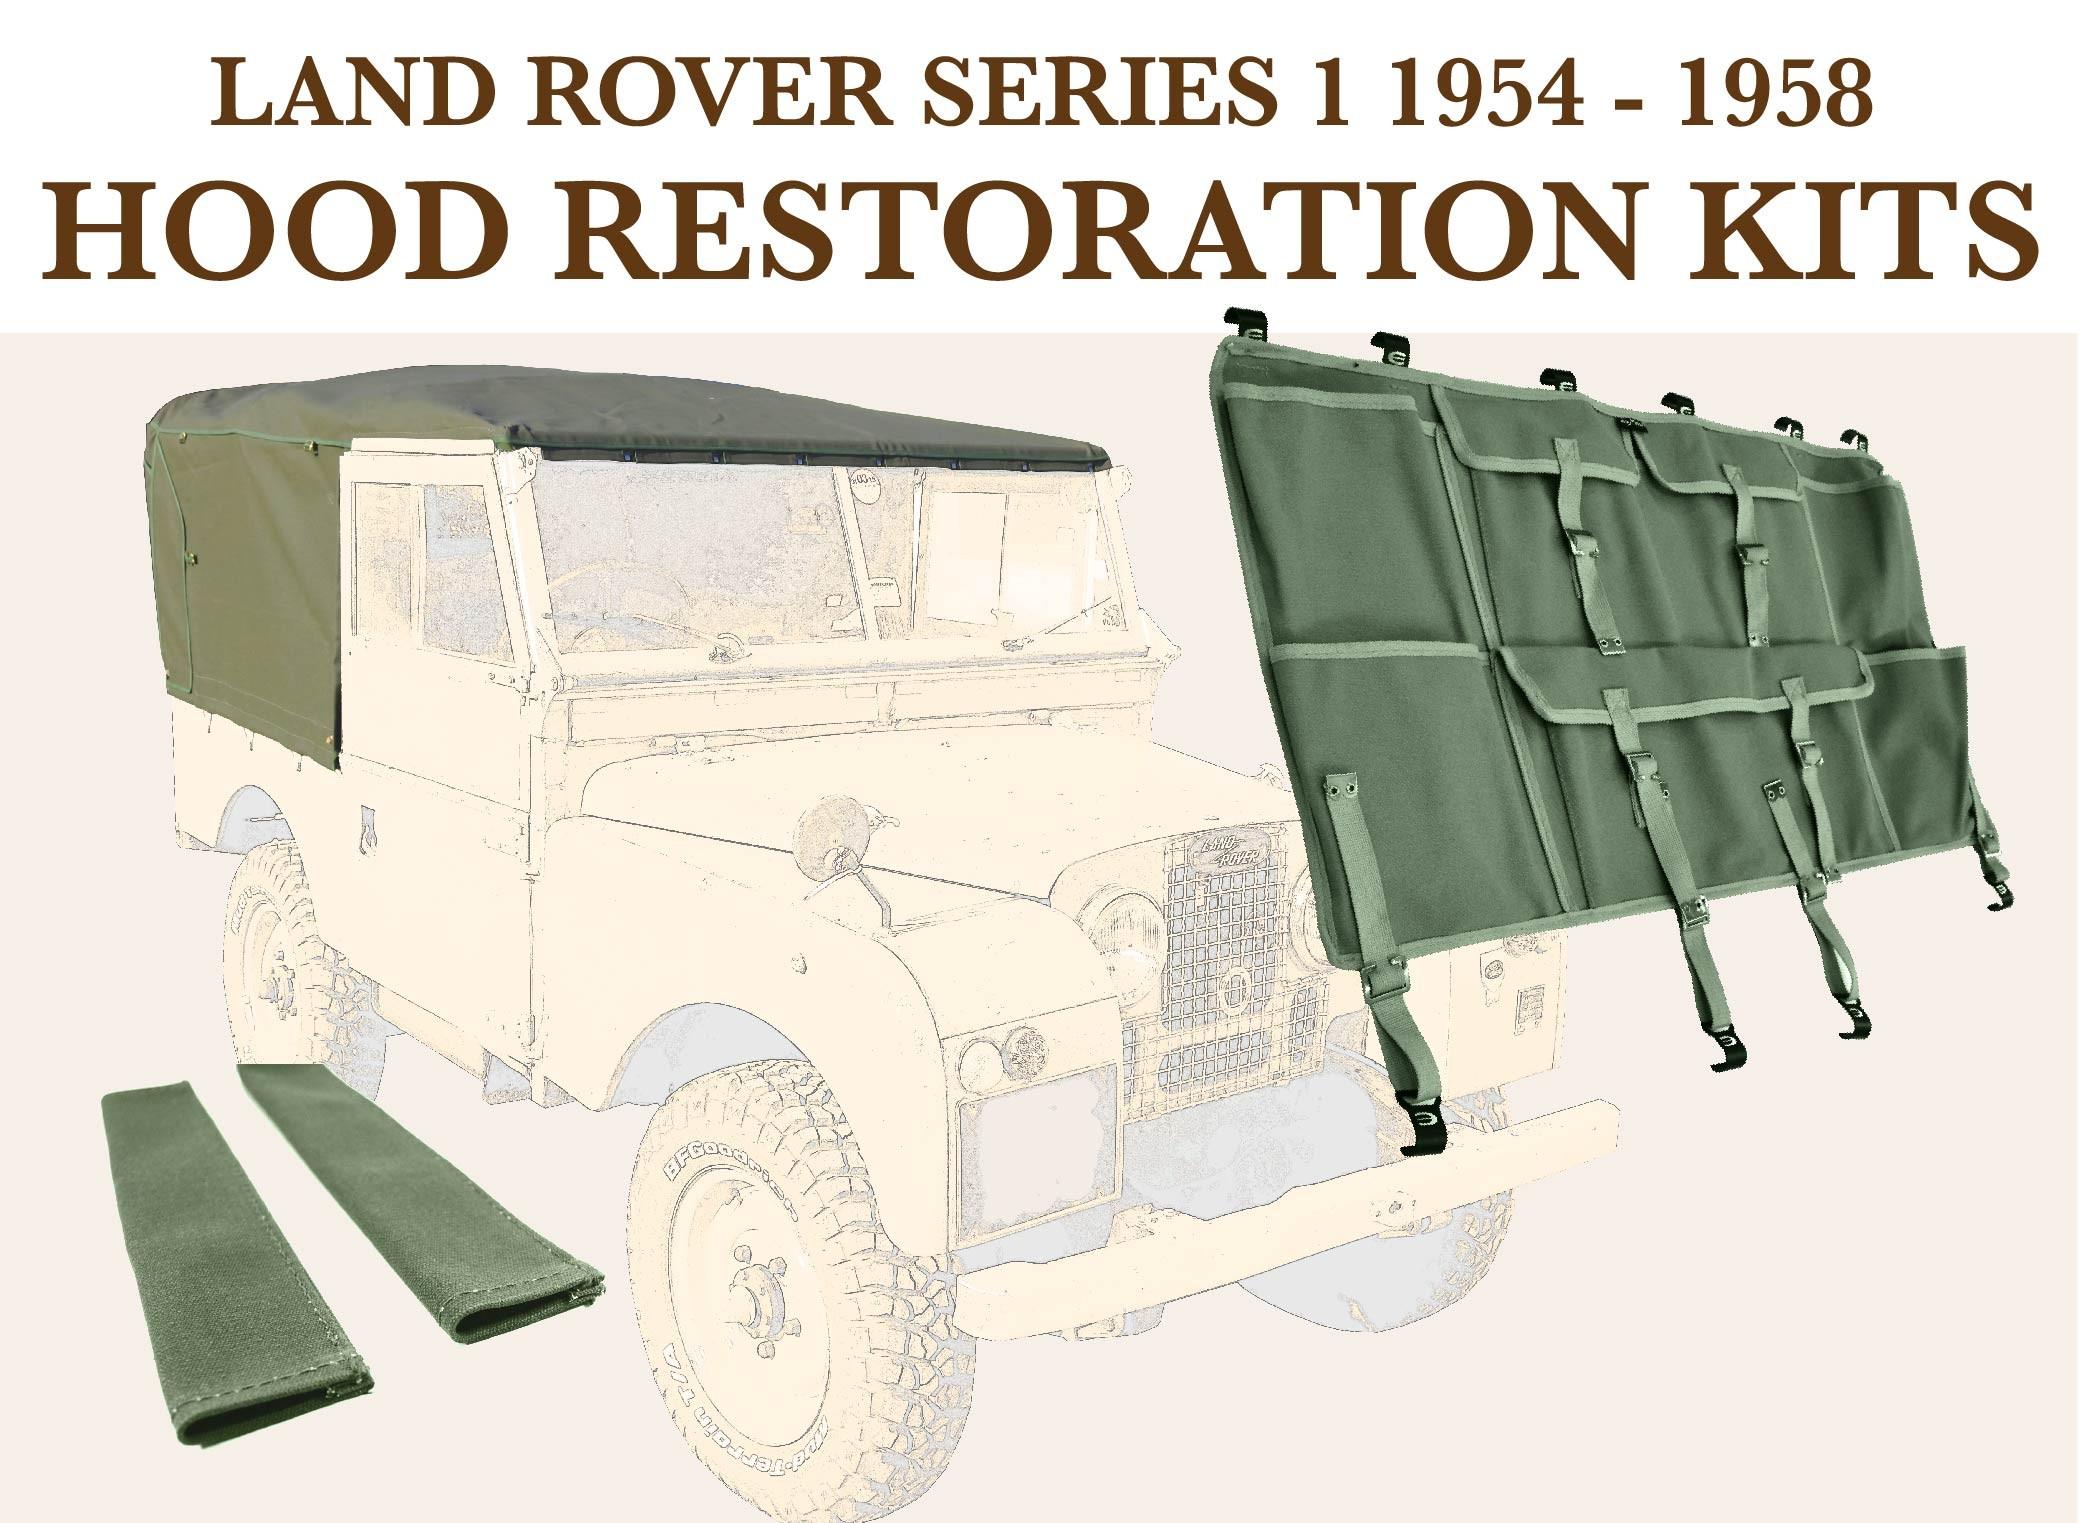 hood restoration kits